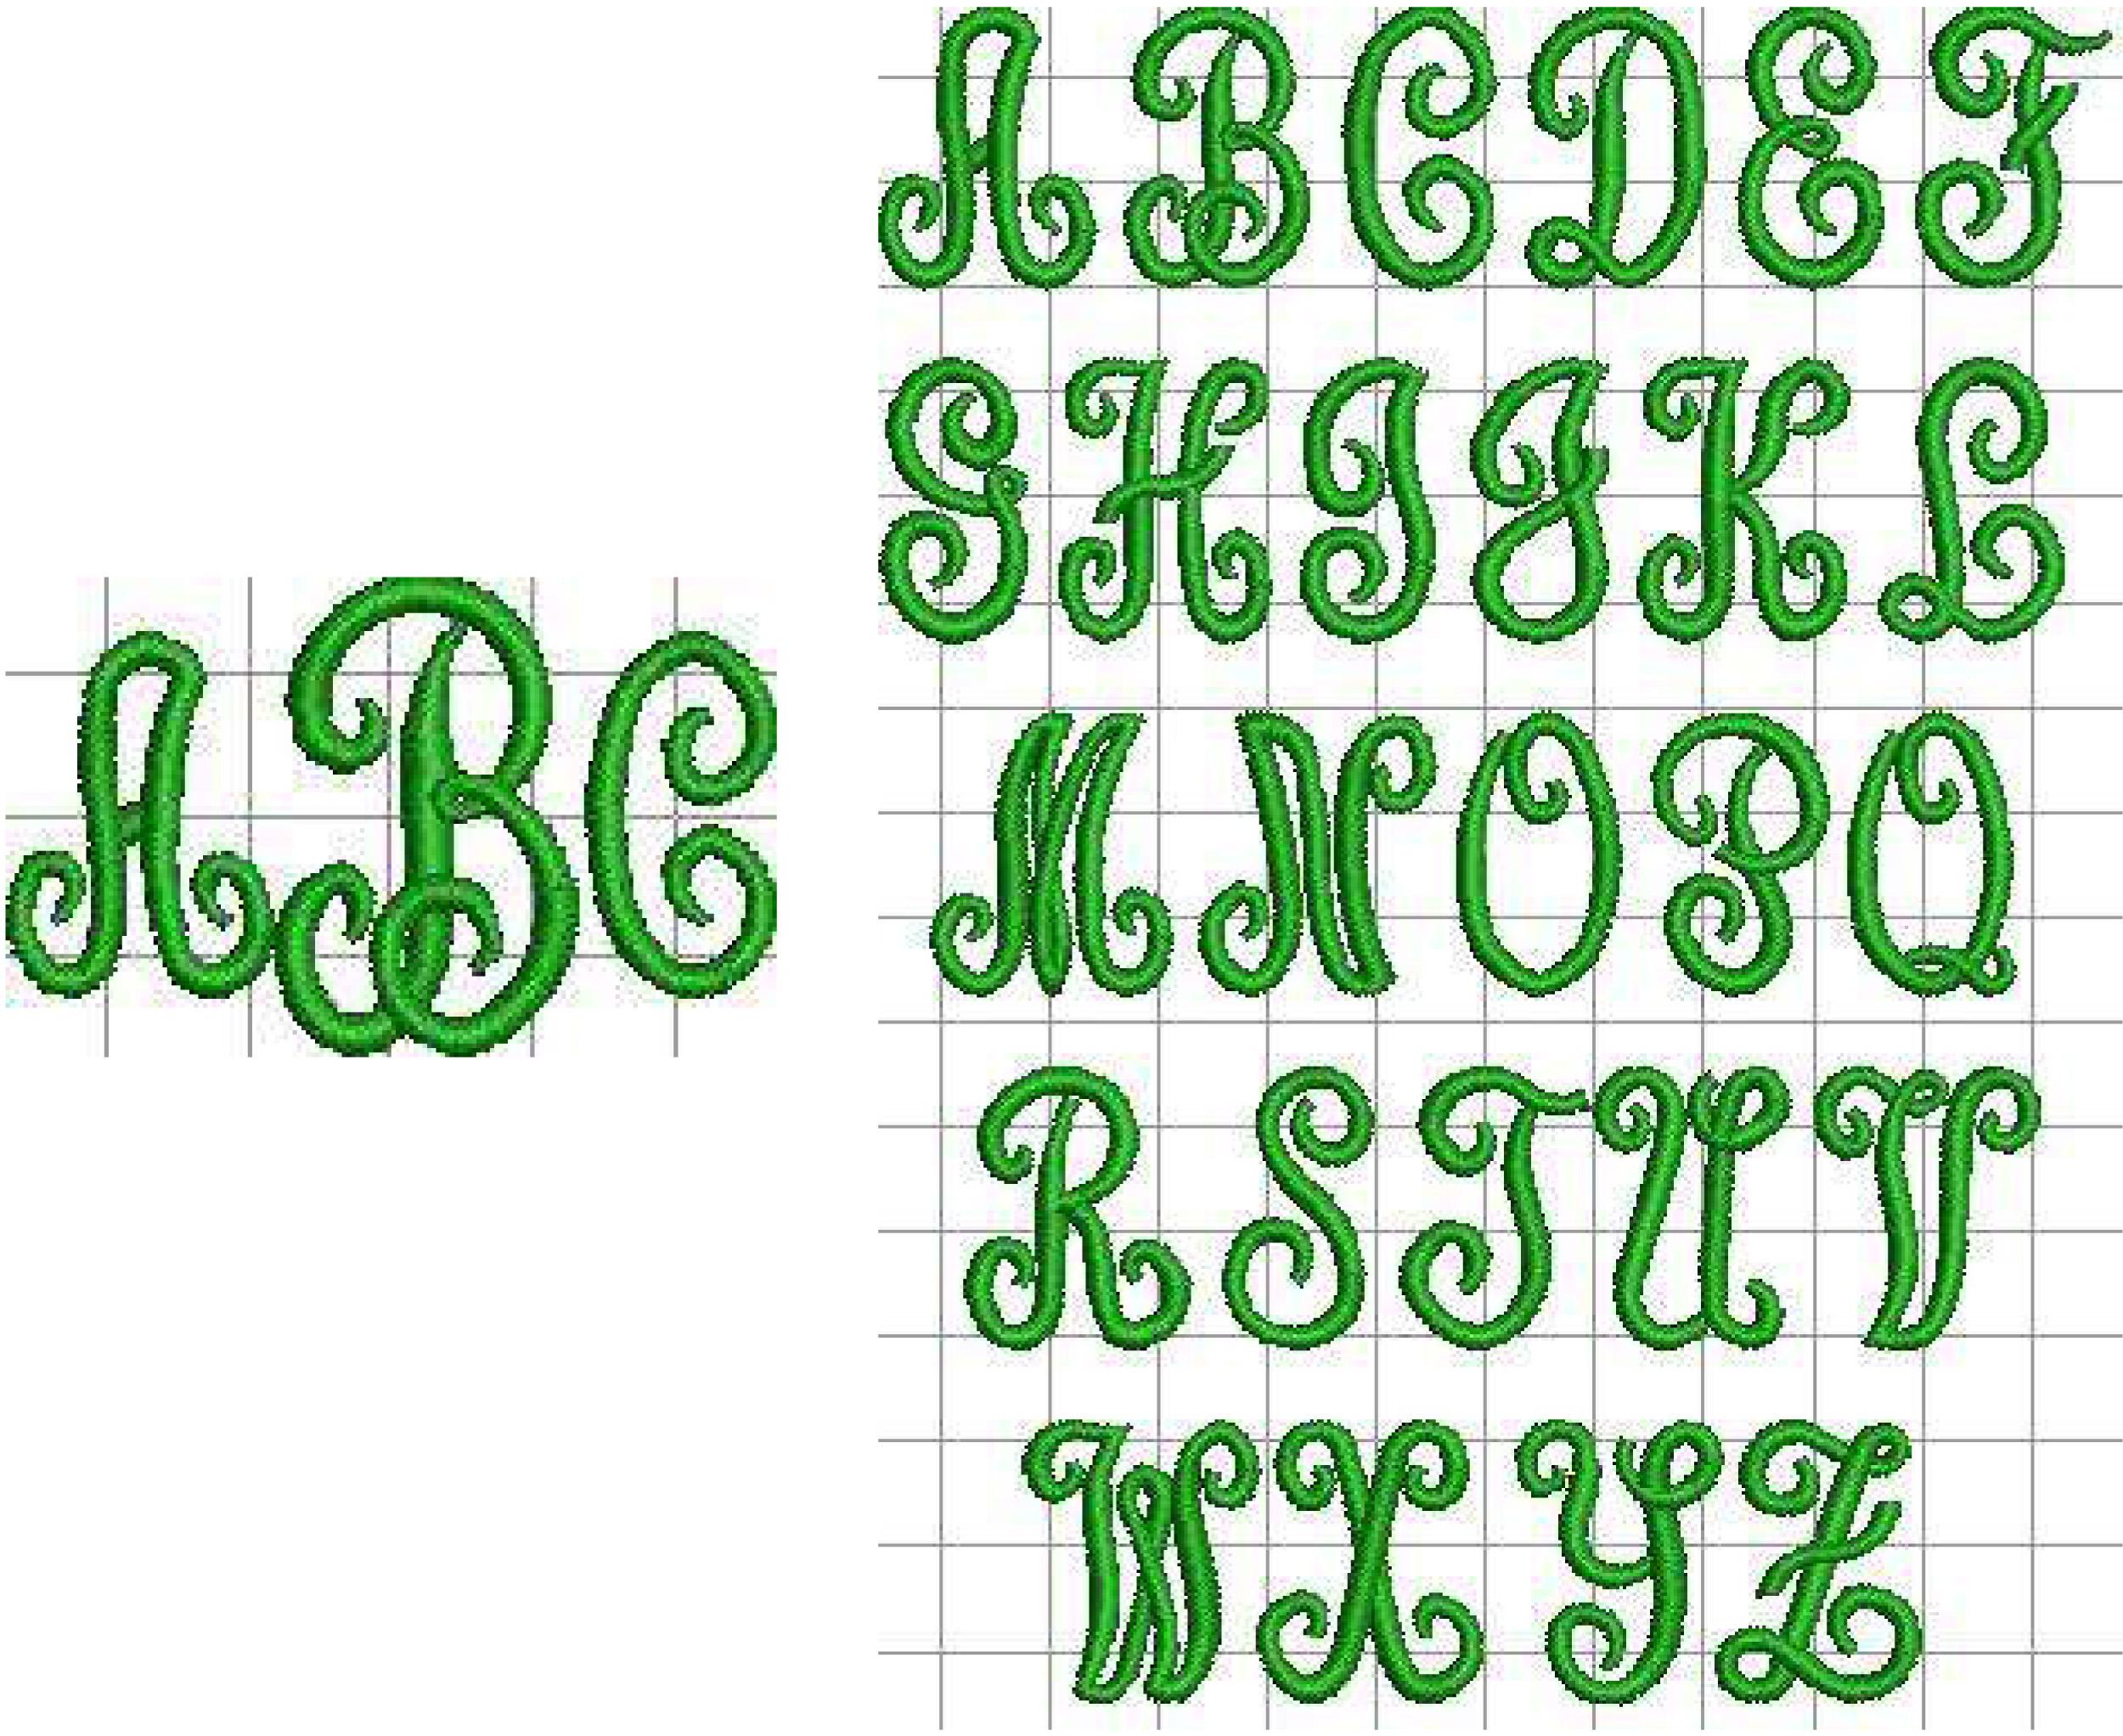 upright-script-monogram.jpg